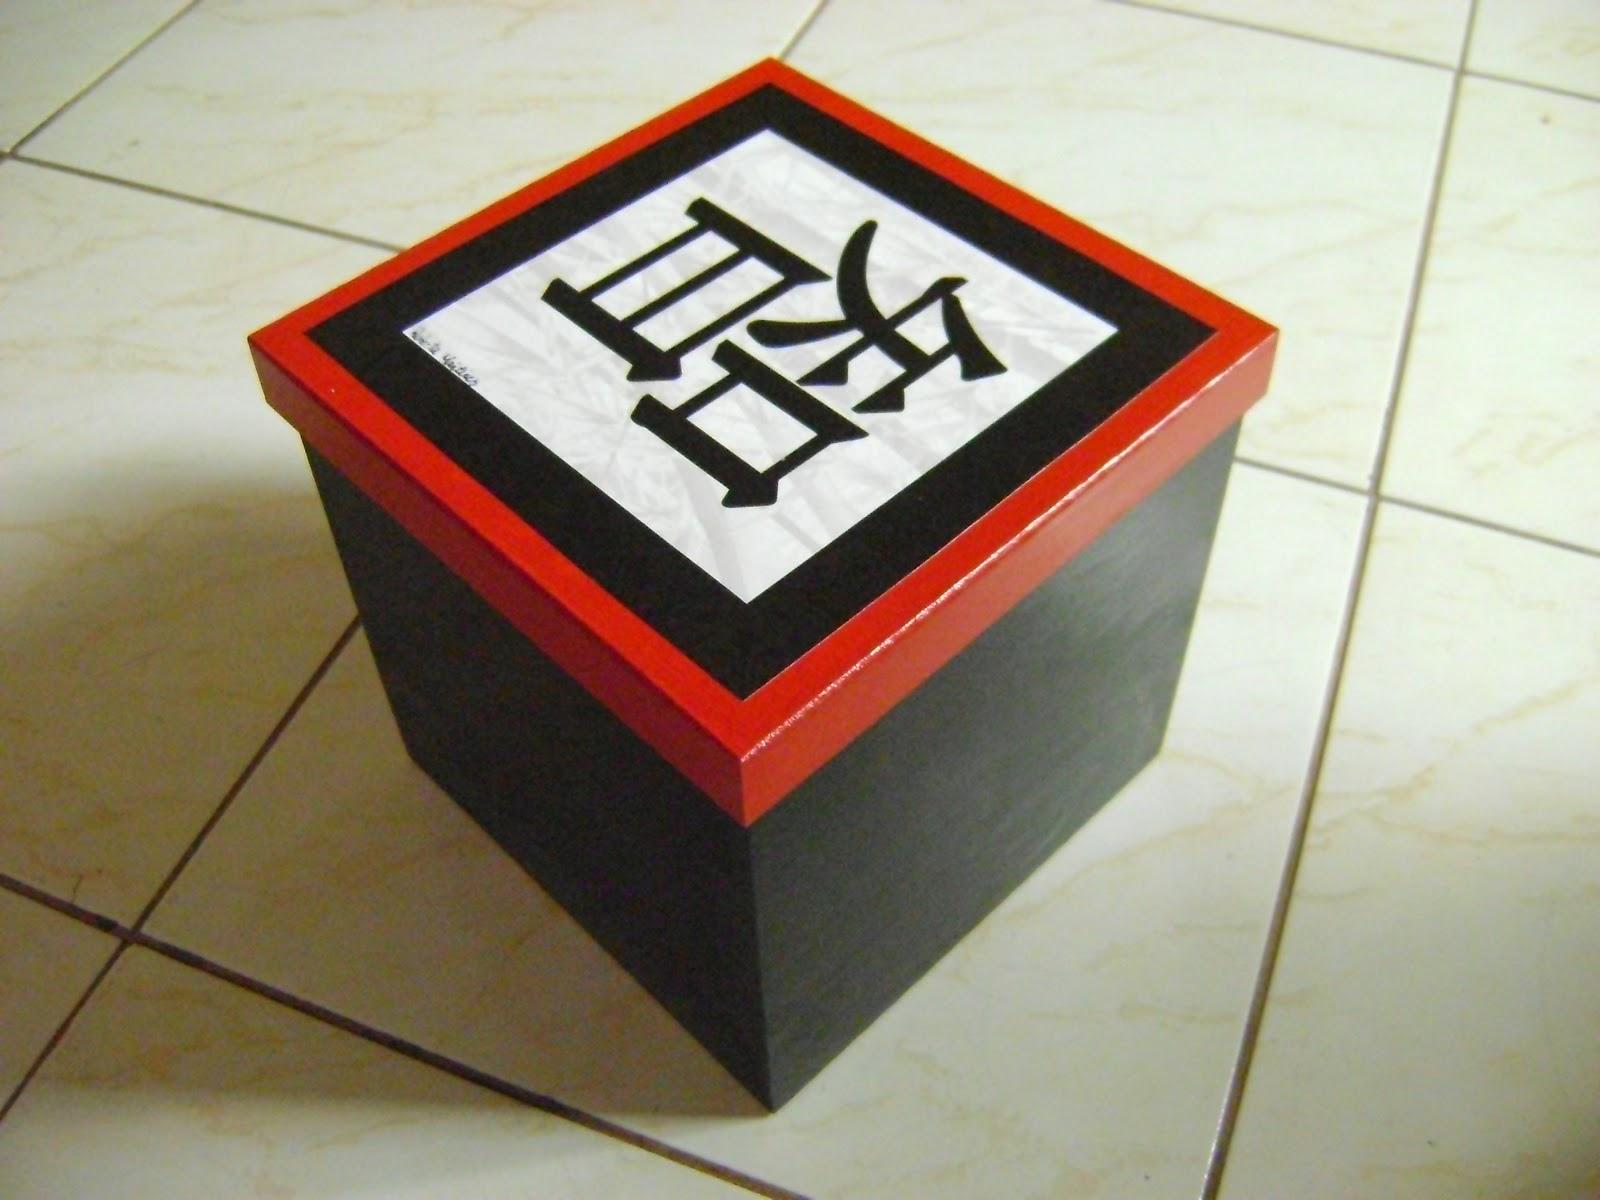 Multif rio artes caixa para guardar cds - Para guardar cds ...